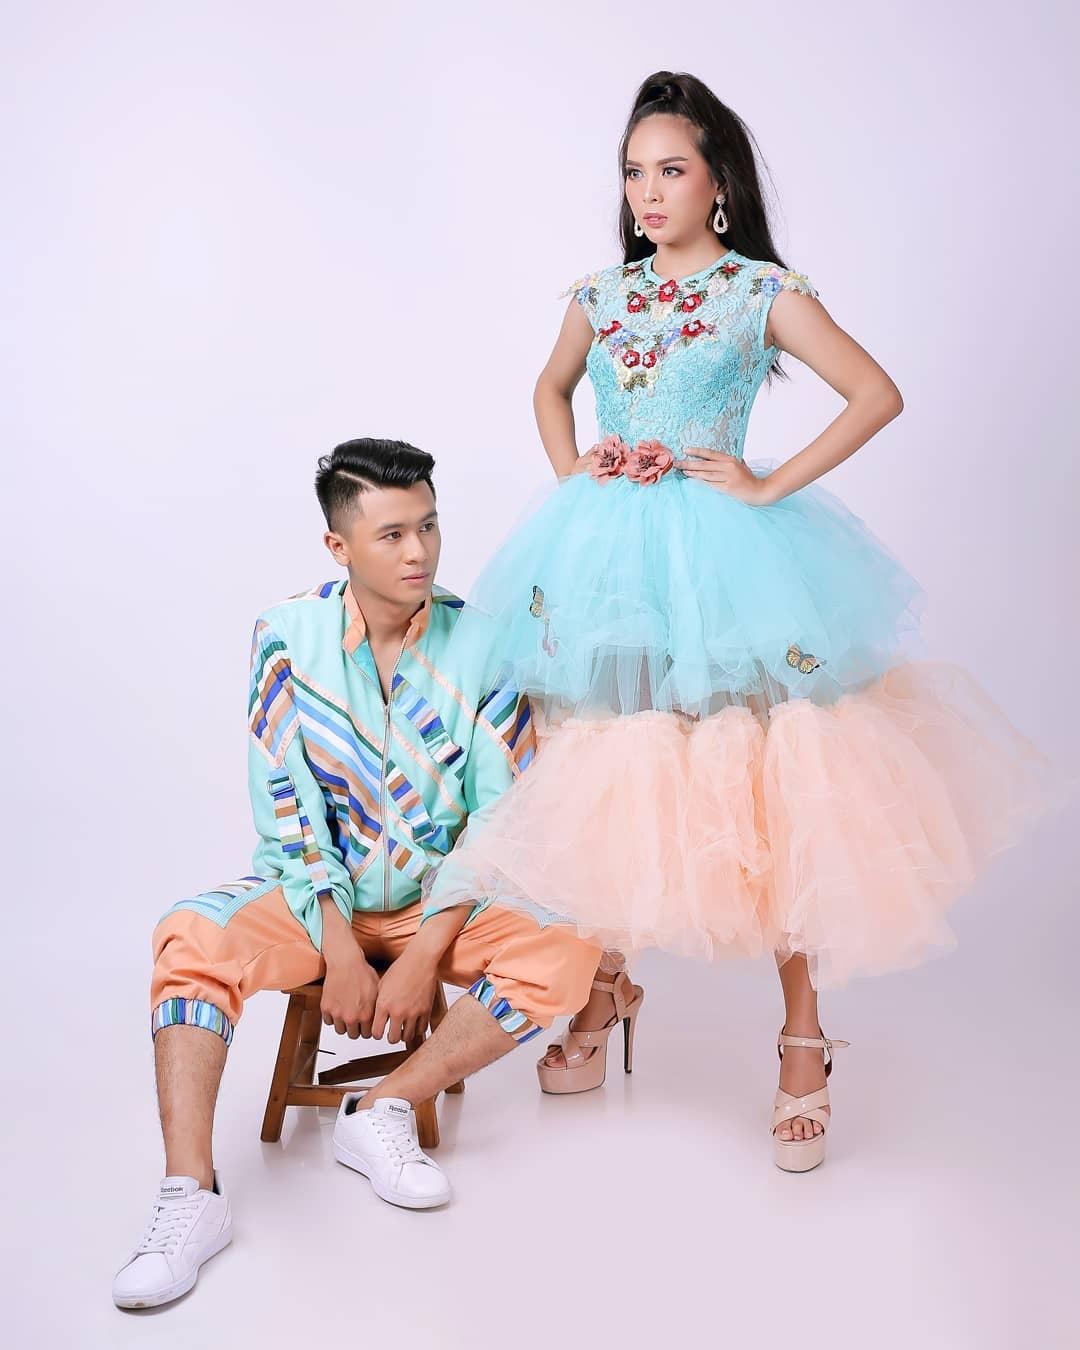 Mengenal-Lebih-Dekat-Nurrohman-Adi-Assajjad-dan-Jasmine-Sylphia-Valentine-Putera-Puteri-Kebudayaan-Indonesia-Jawa-Timur-2020